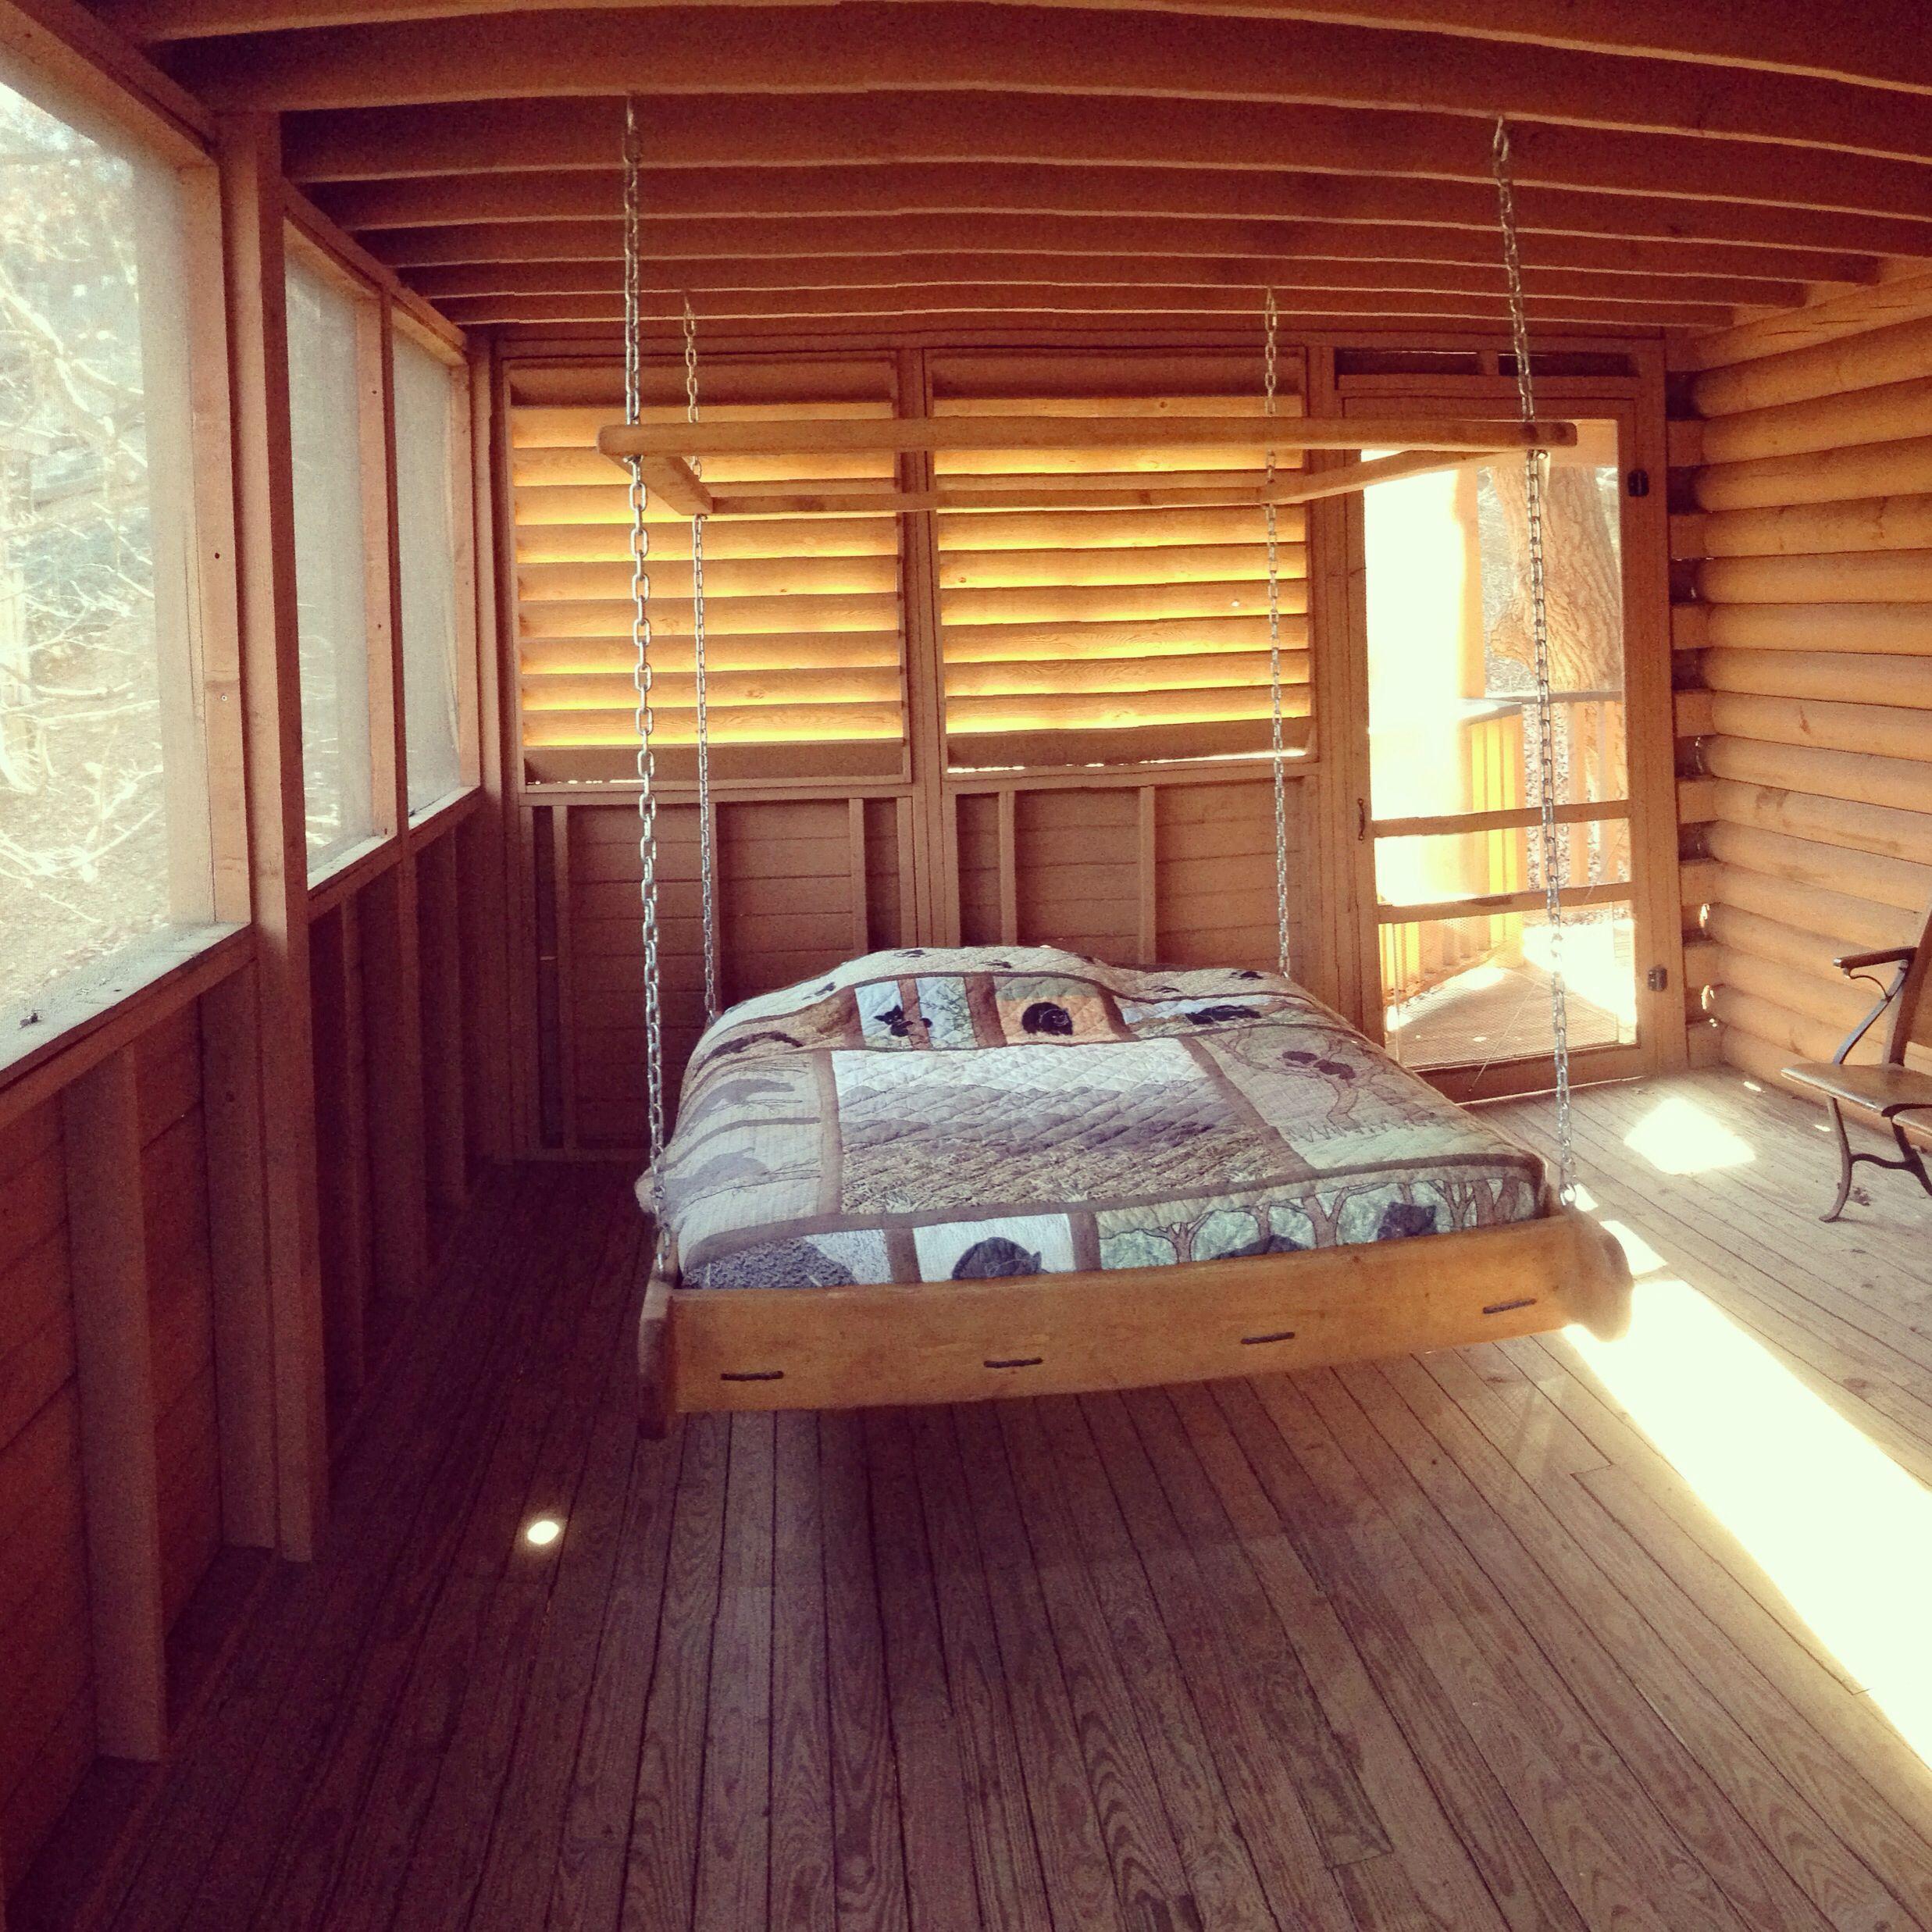 ba photos br mountains cabin rentals rate smoky bedroom interior oak overlooking the cabins mountain nightly luxury sleeps